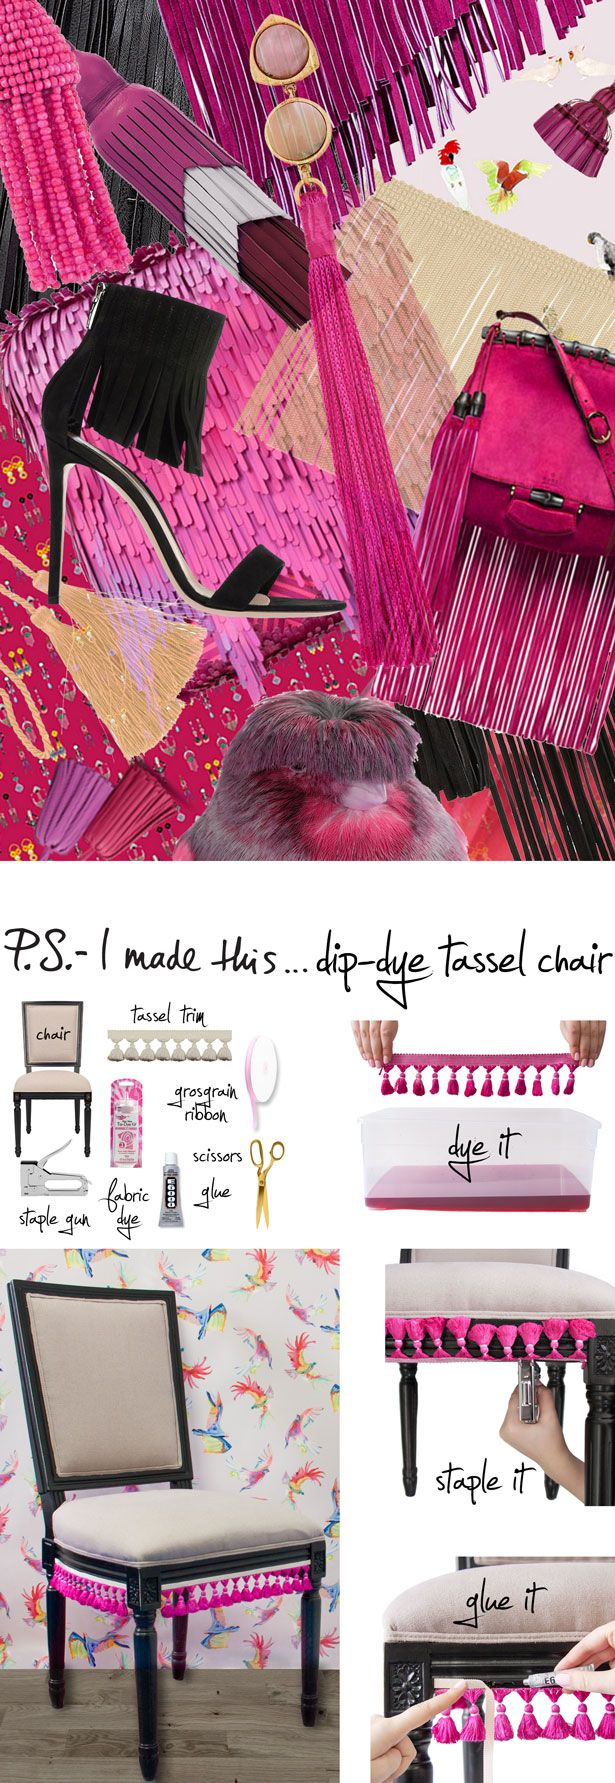 Dip-Dye Tassel Chair